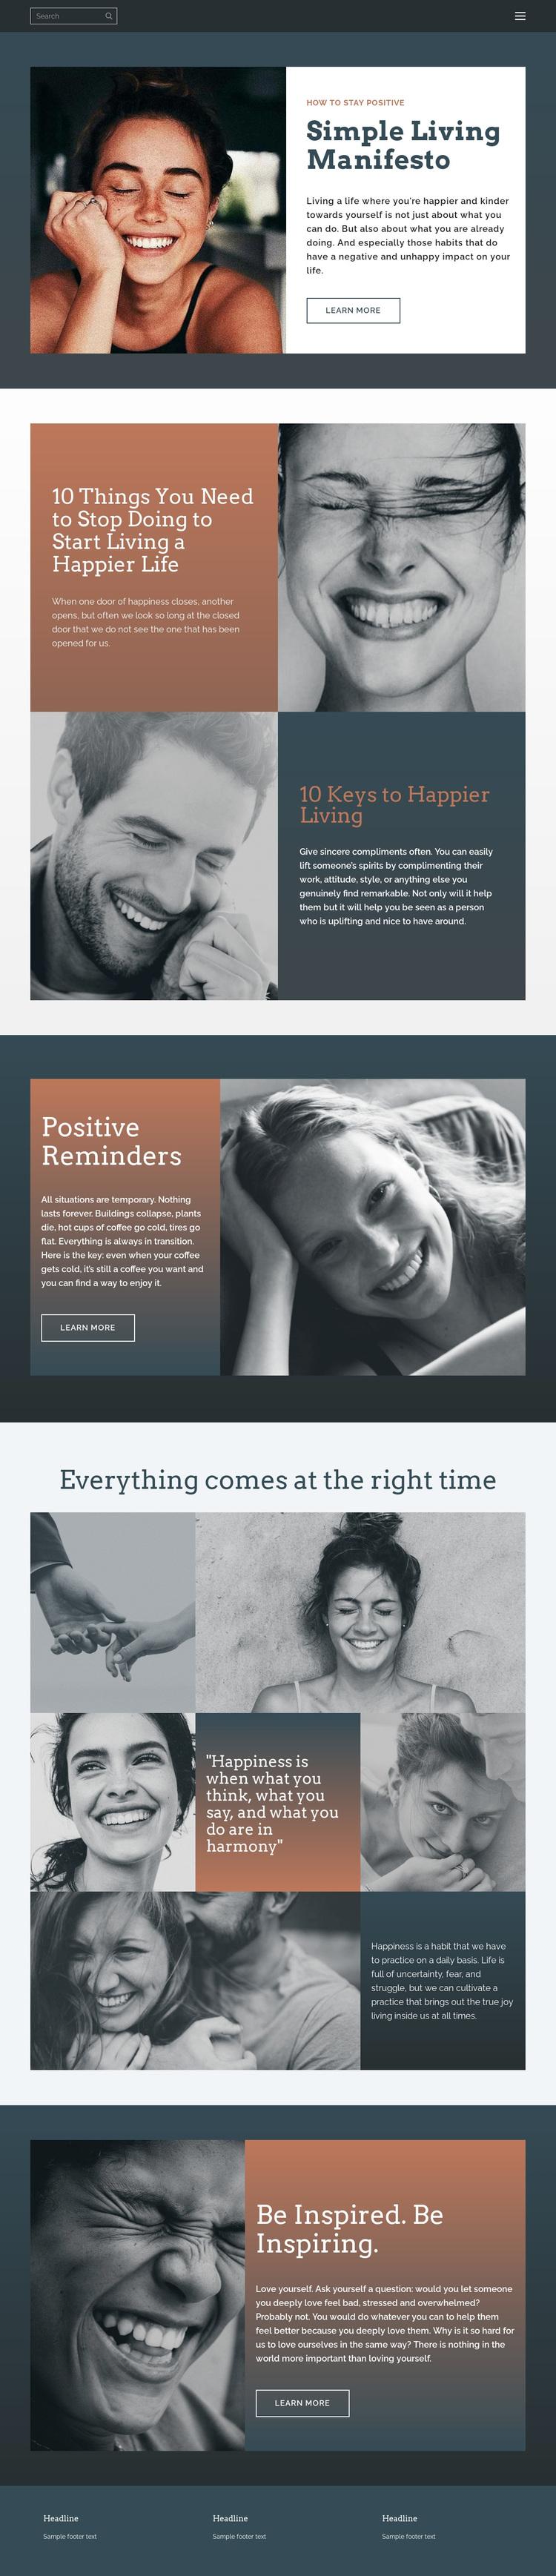 Simple living manifesto Template